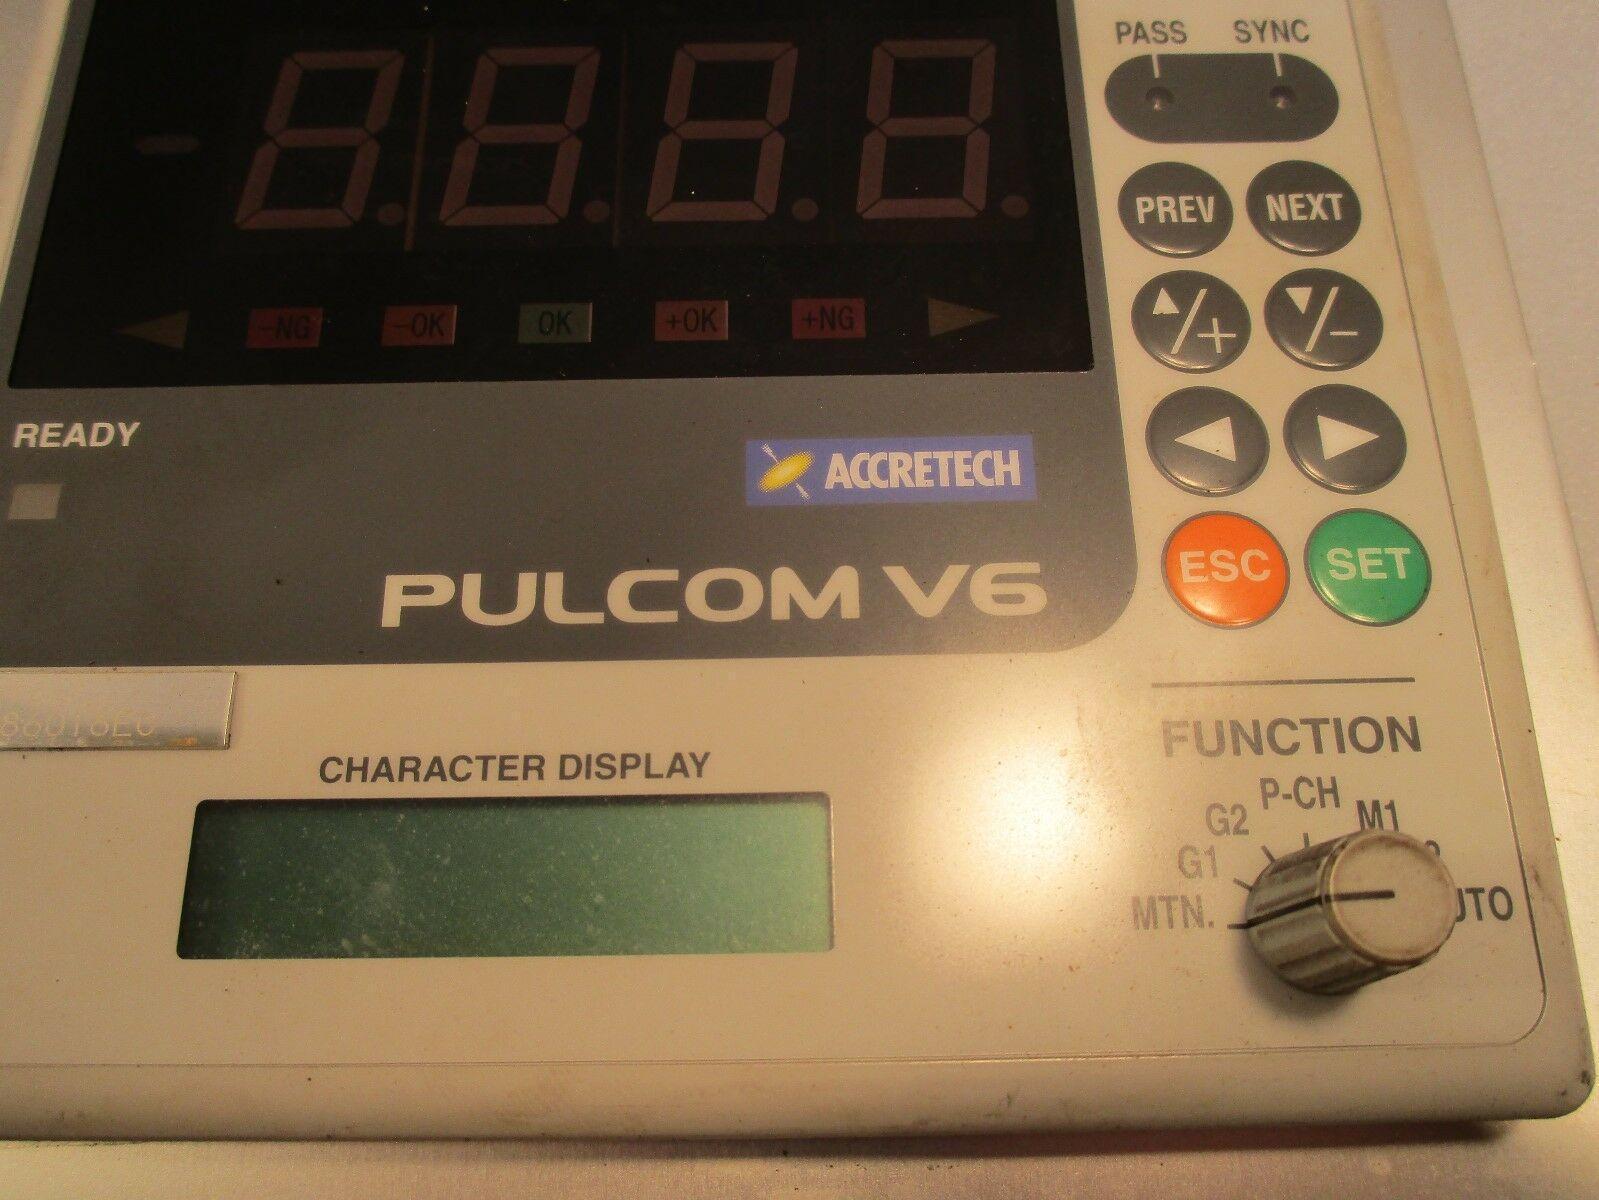 Accretech Pulcom V6 Flexible Electronic Micrometer Readout Panel Control Box